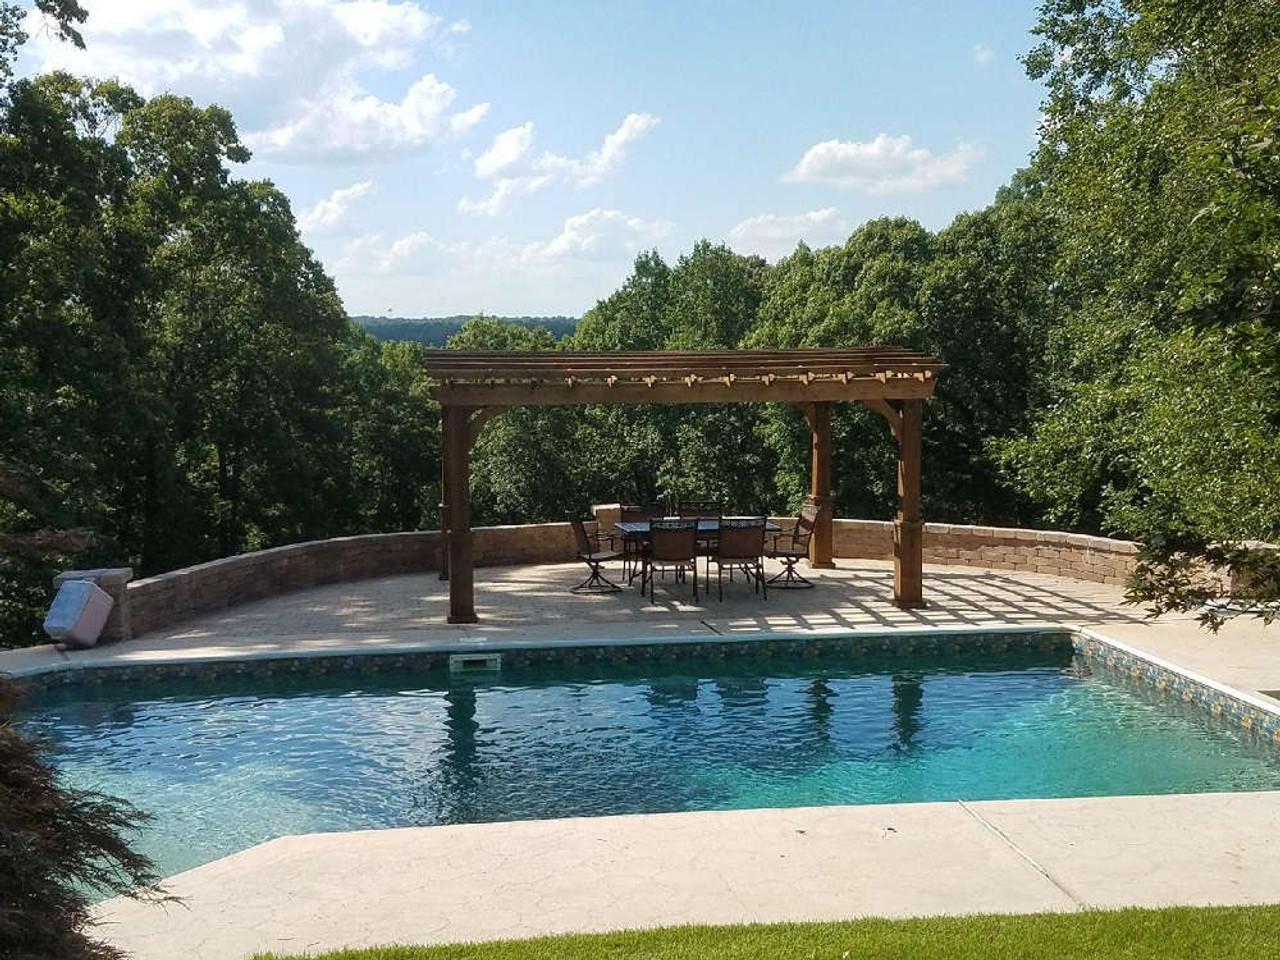 12x16 Arched Cedar Pergola Kit, Poolside, Whitesburg, Georgia